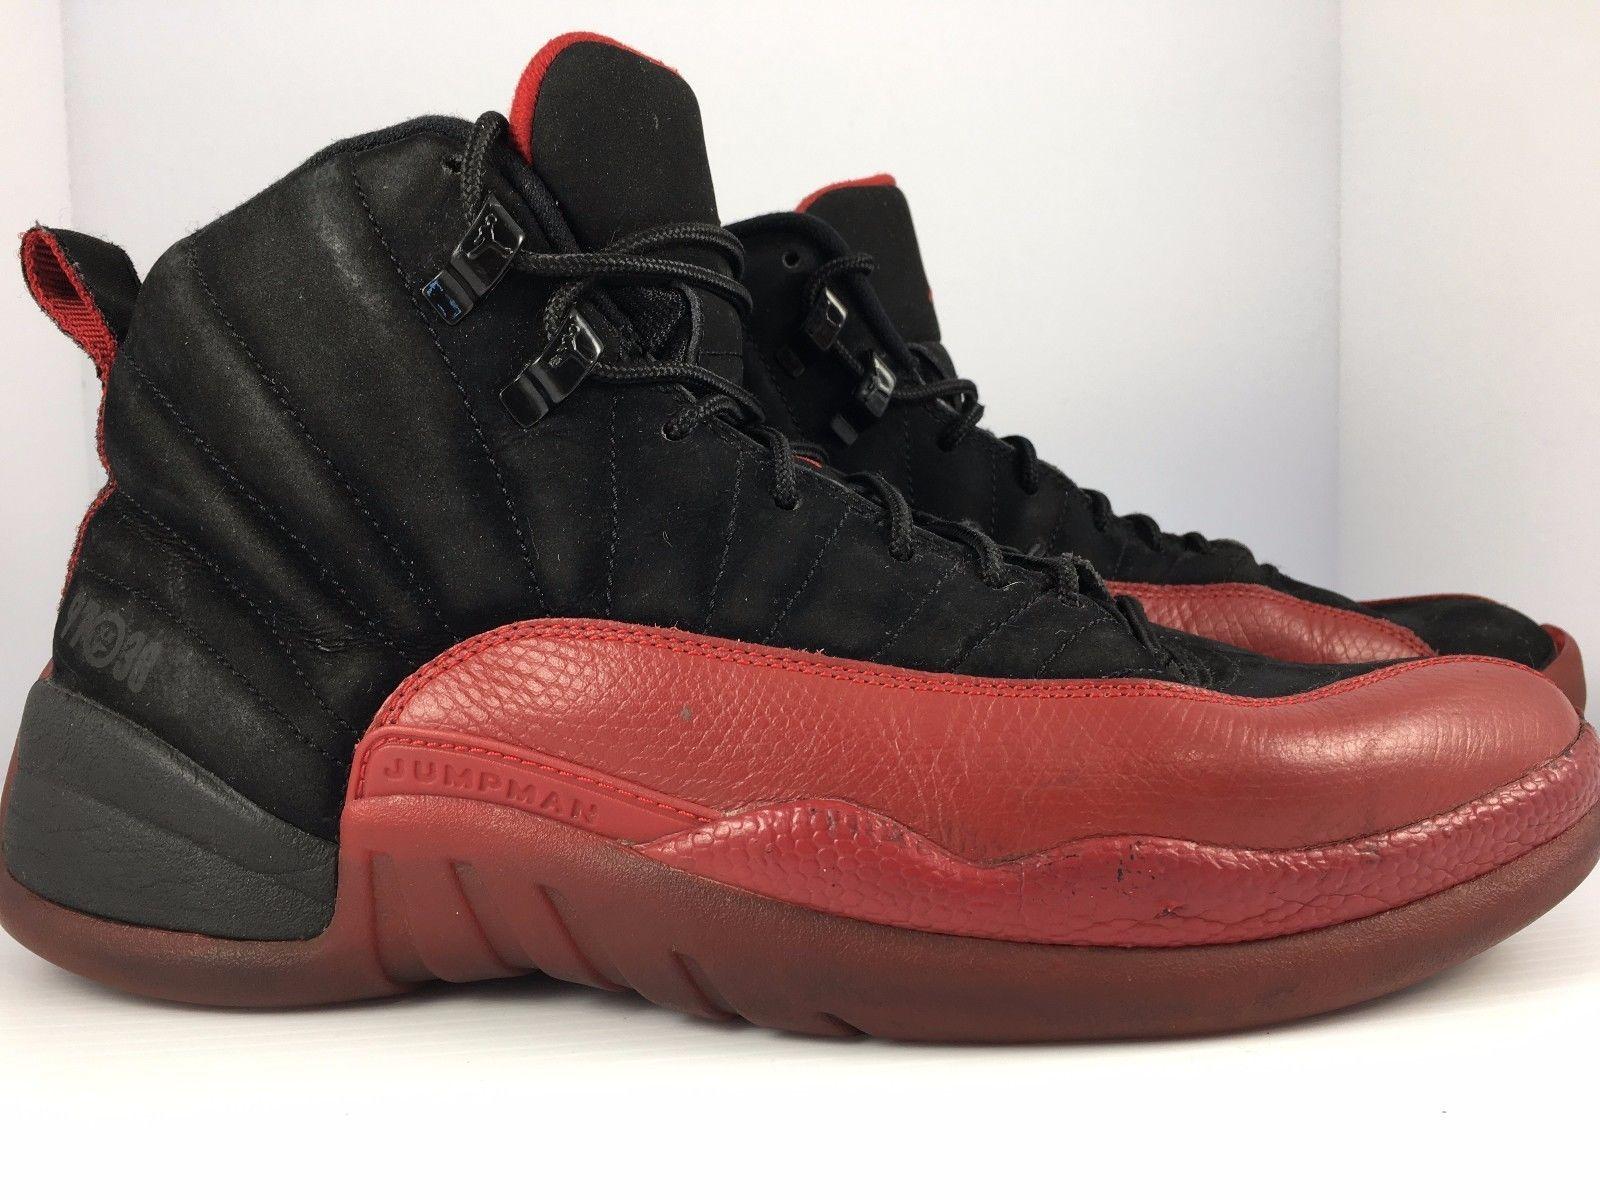 fbcd9e6cc Men s Nike Air Jordan XII 12